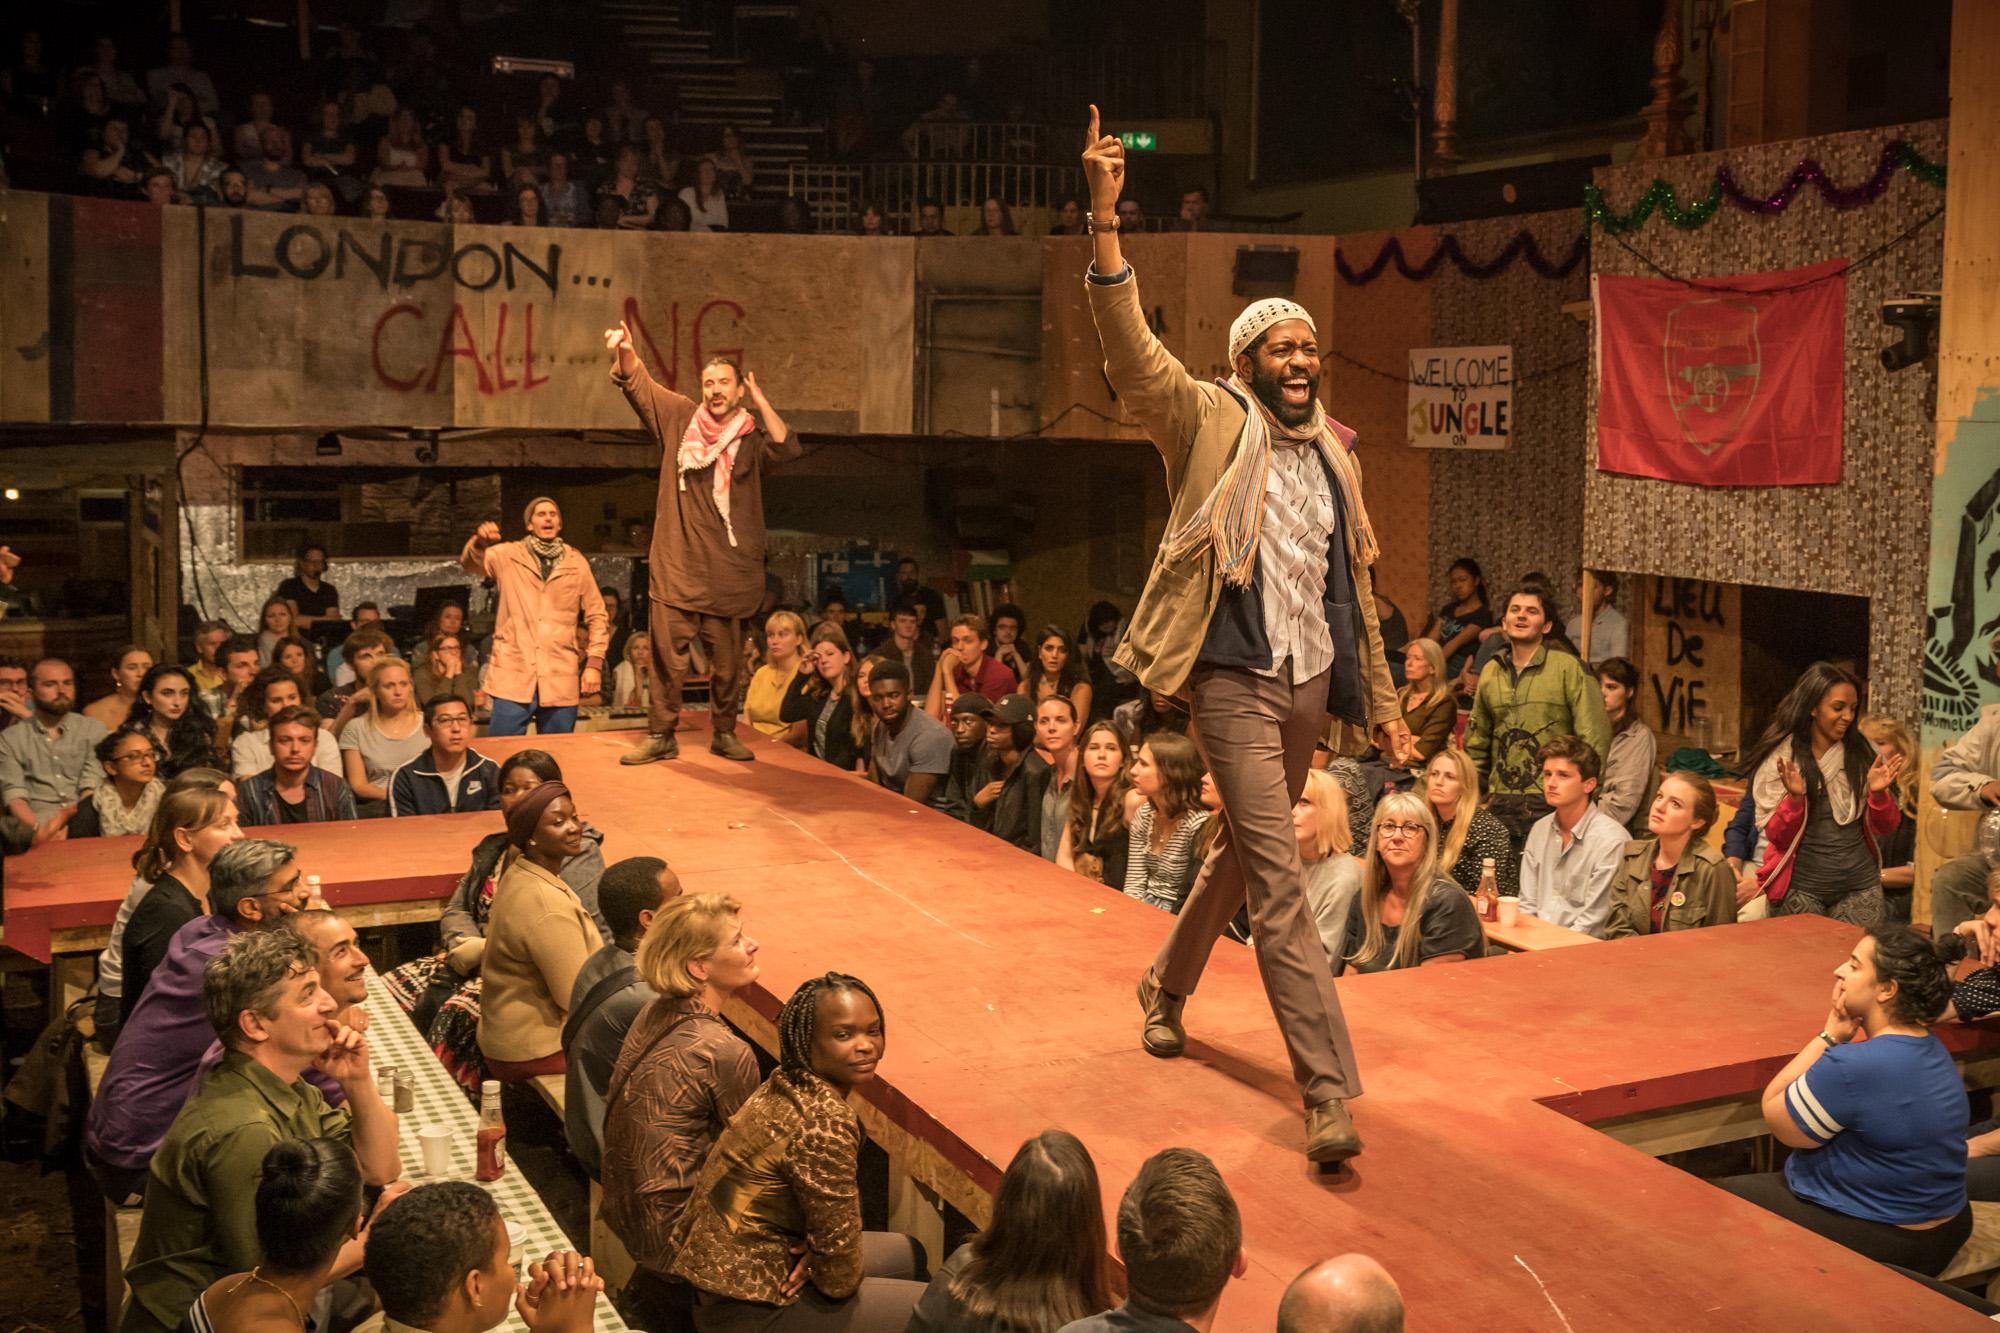 The Jungle • Playhouse Theatre • Dir. Stephen Daldry